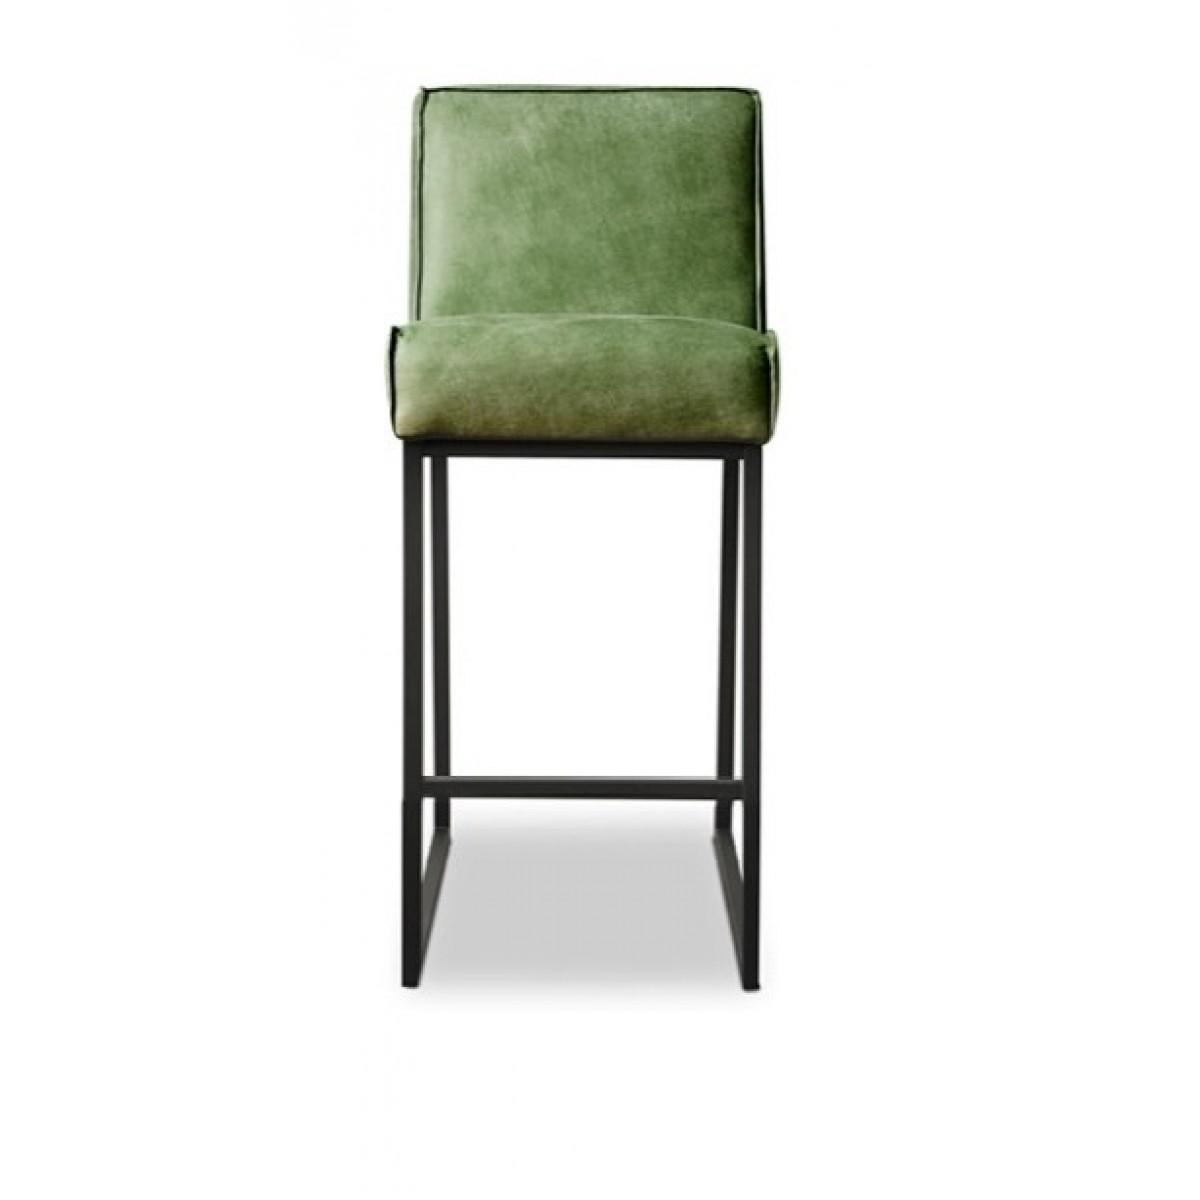 barkruk-barhocker-stool-het-anker-lara-miltonhouse-voor